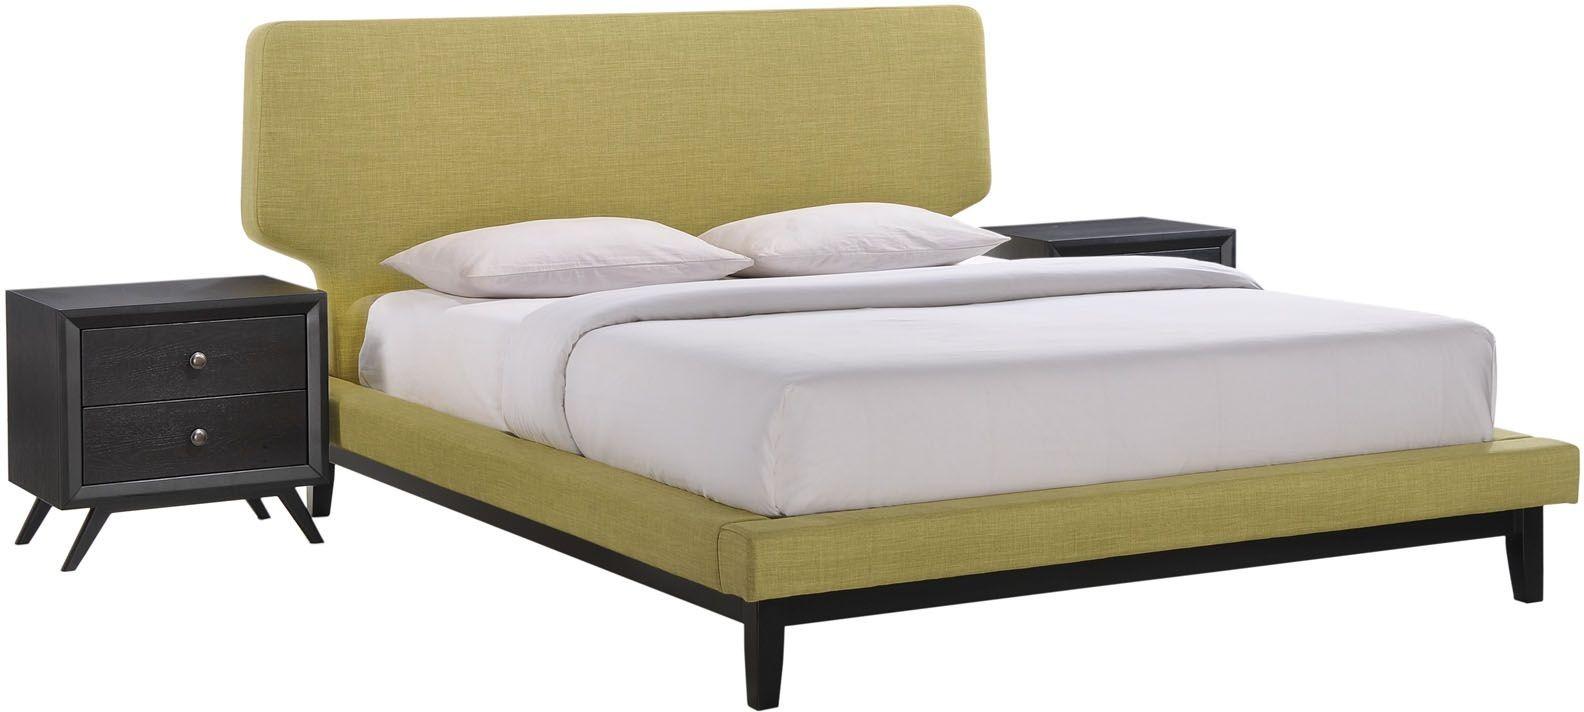 bethany black green 3 piece queen platform bedroom set from renegade coleman furniture. Black Bedroom Furniture Sets. Home Design Ideas